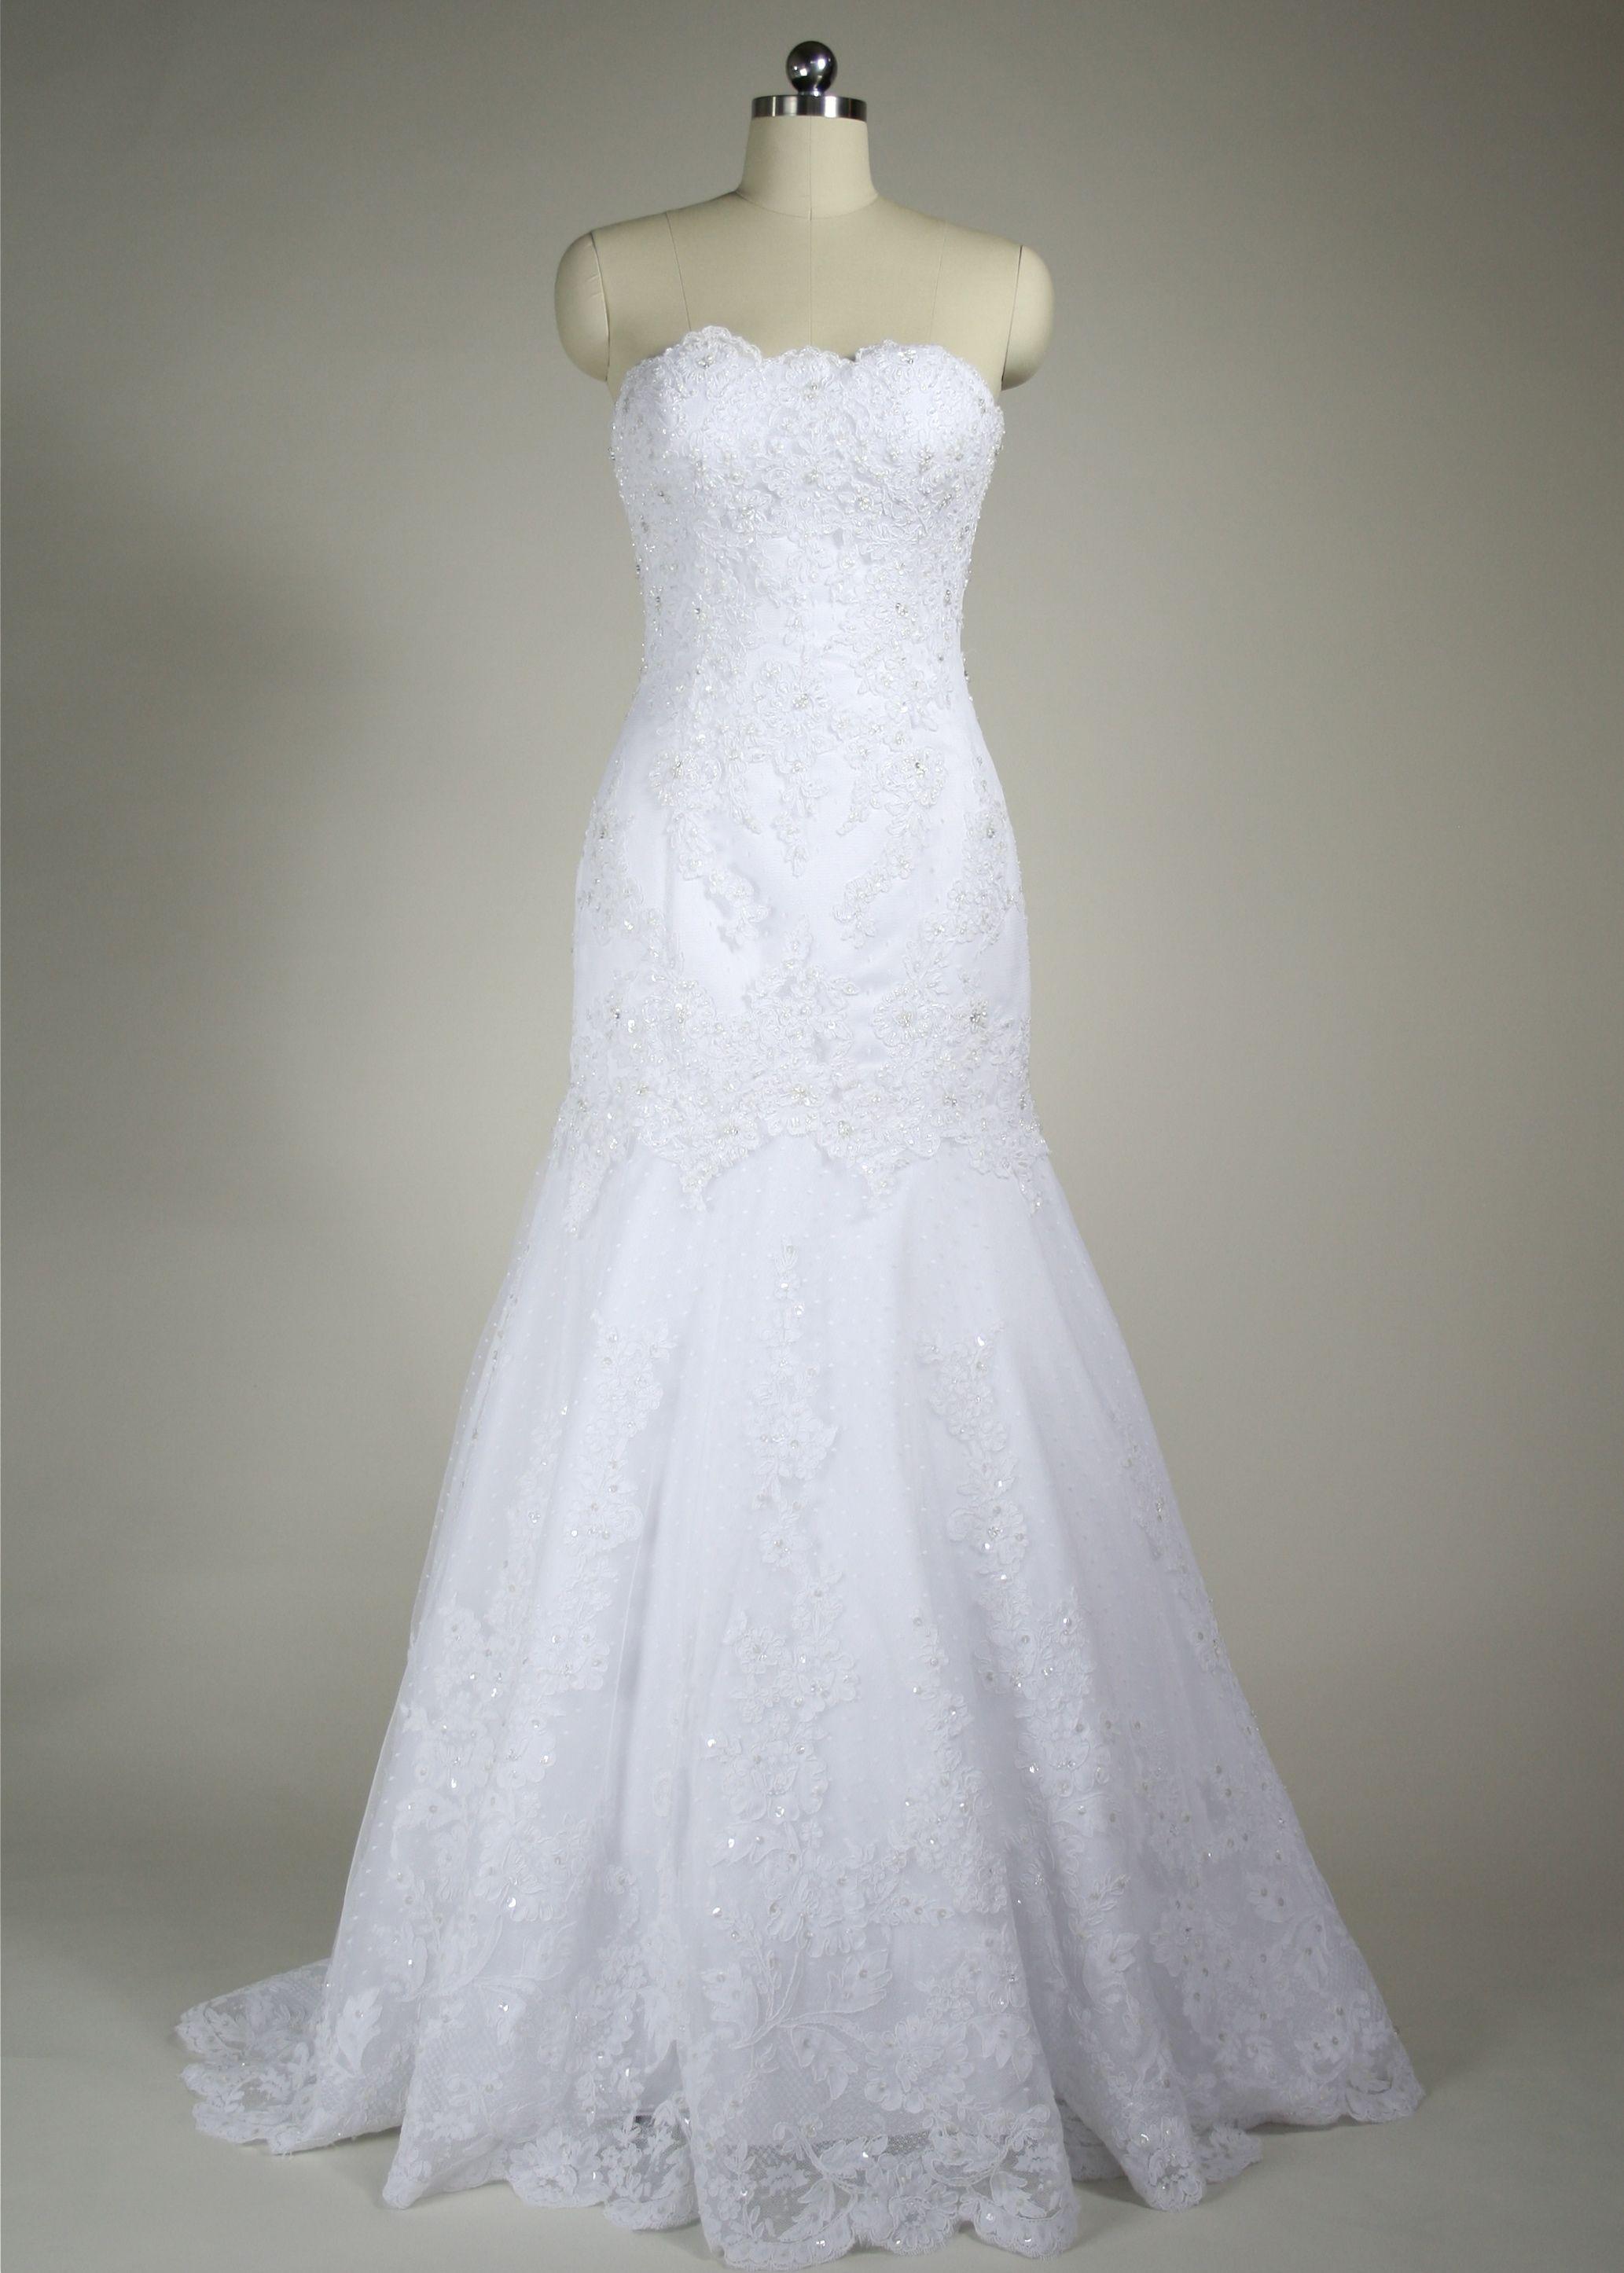 Angela Betasi | Lace wedding gowns - Seattle | Pinterest